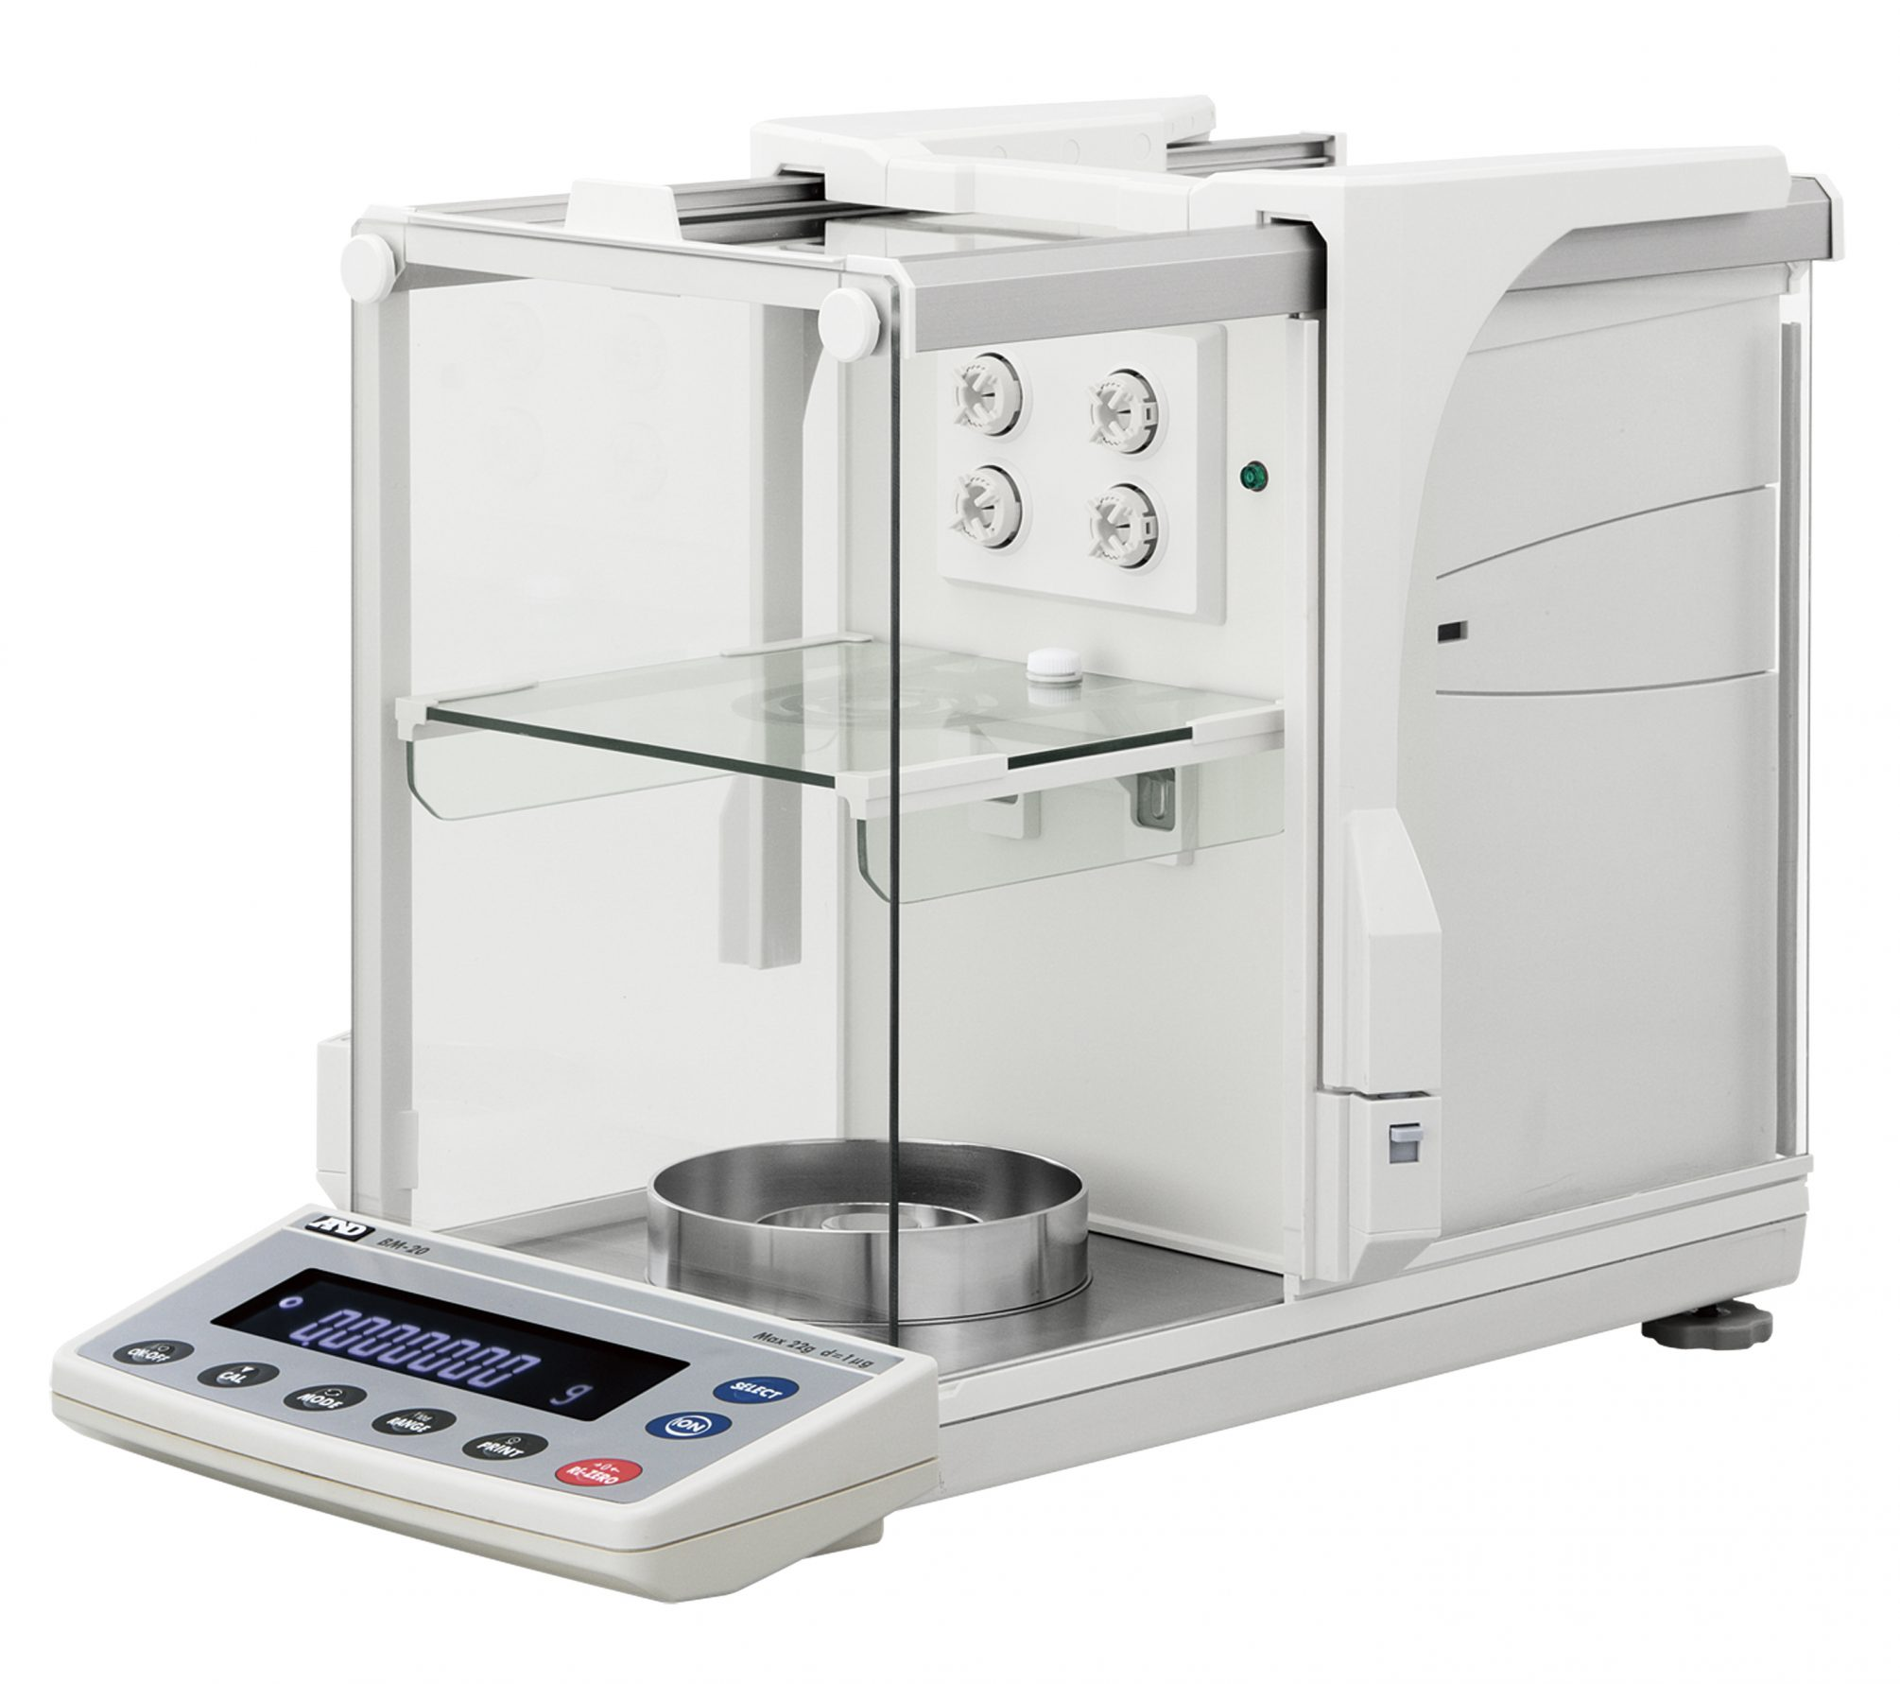 BM-20 micro-analytical balance, A&D